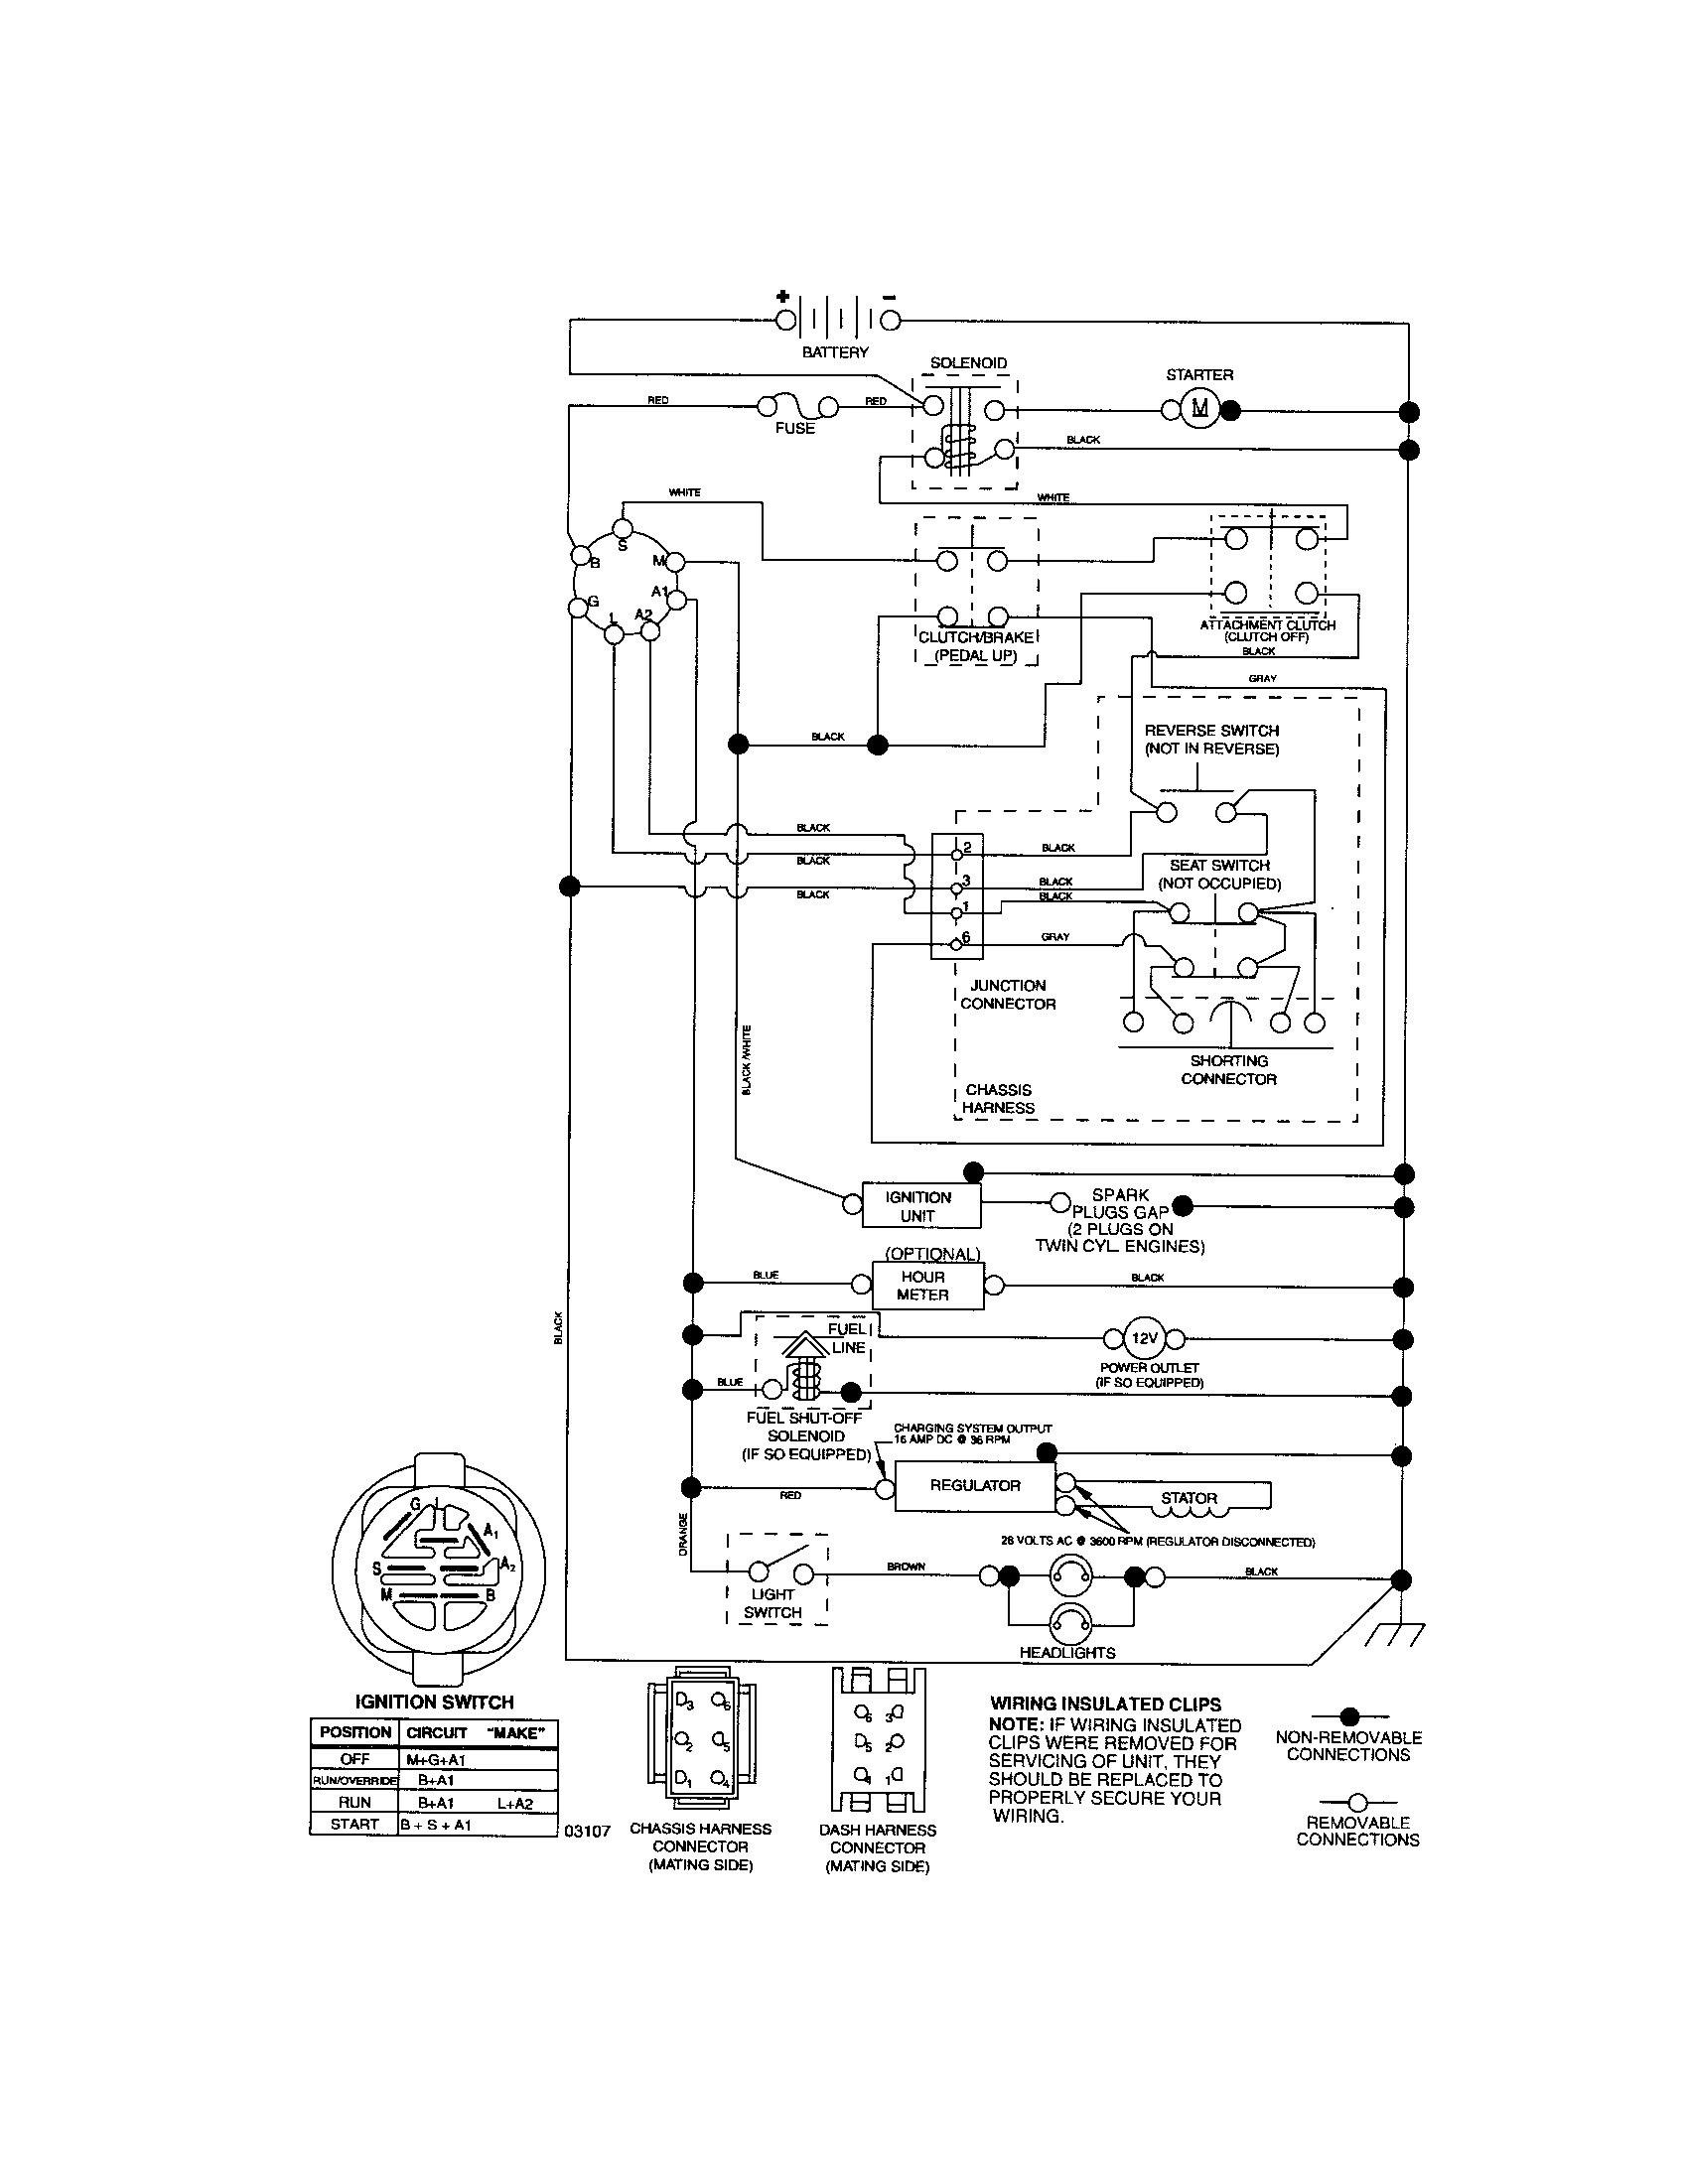 wiring diagram for craftsman riding lawn mower Collection-Wiring Diagram For Yardman Riding Mower Fresh Craftsman Riding Mower Wiring Diagram 19-b